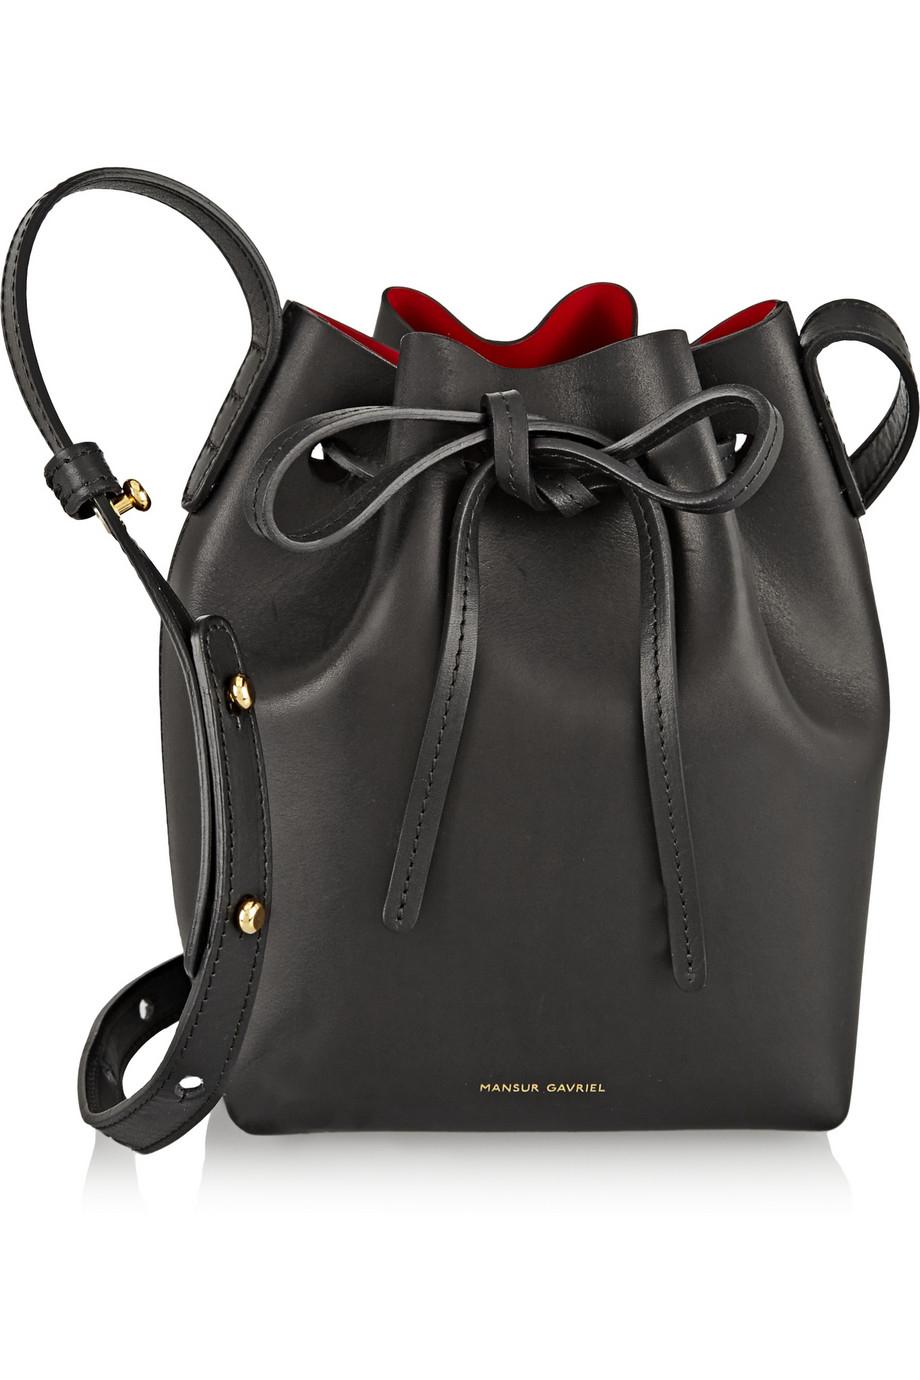 mansur gavriel mini mini leather bucket bag in black lyst. Black Bedroom Furniture Sets. Home Design Ideas